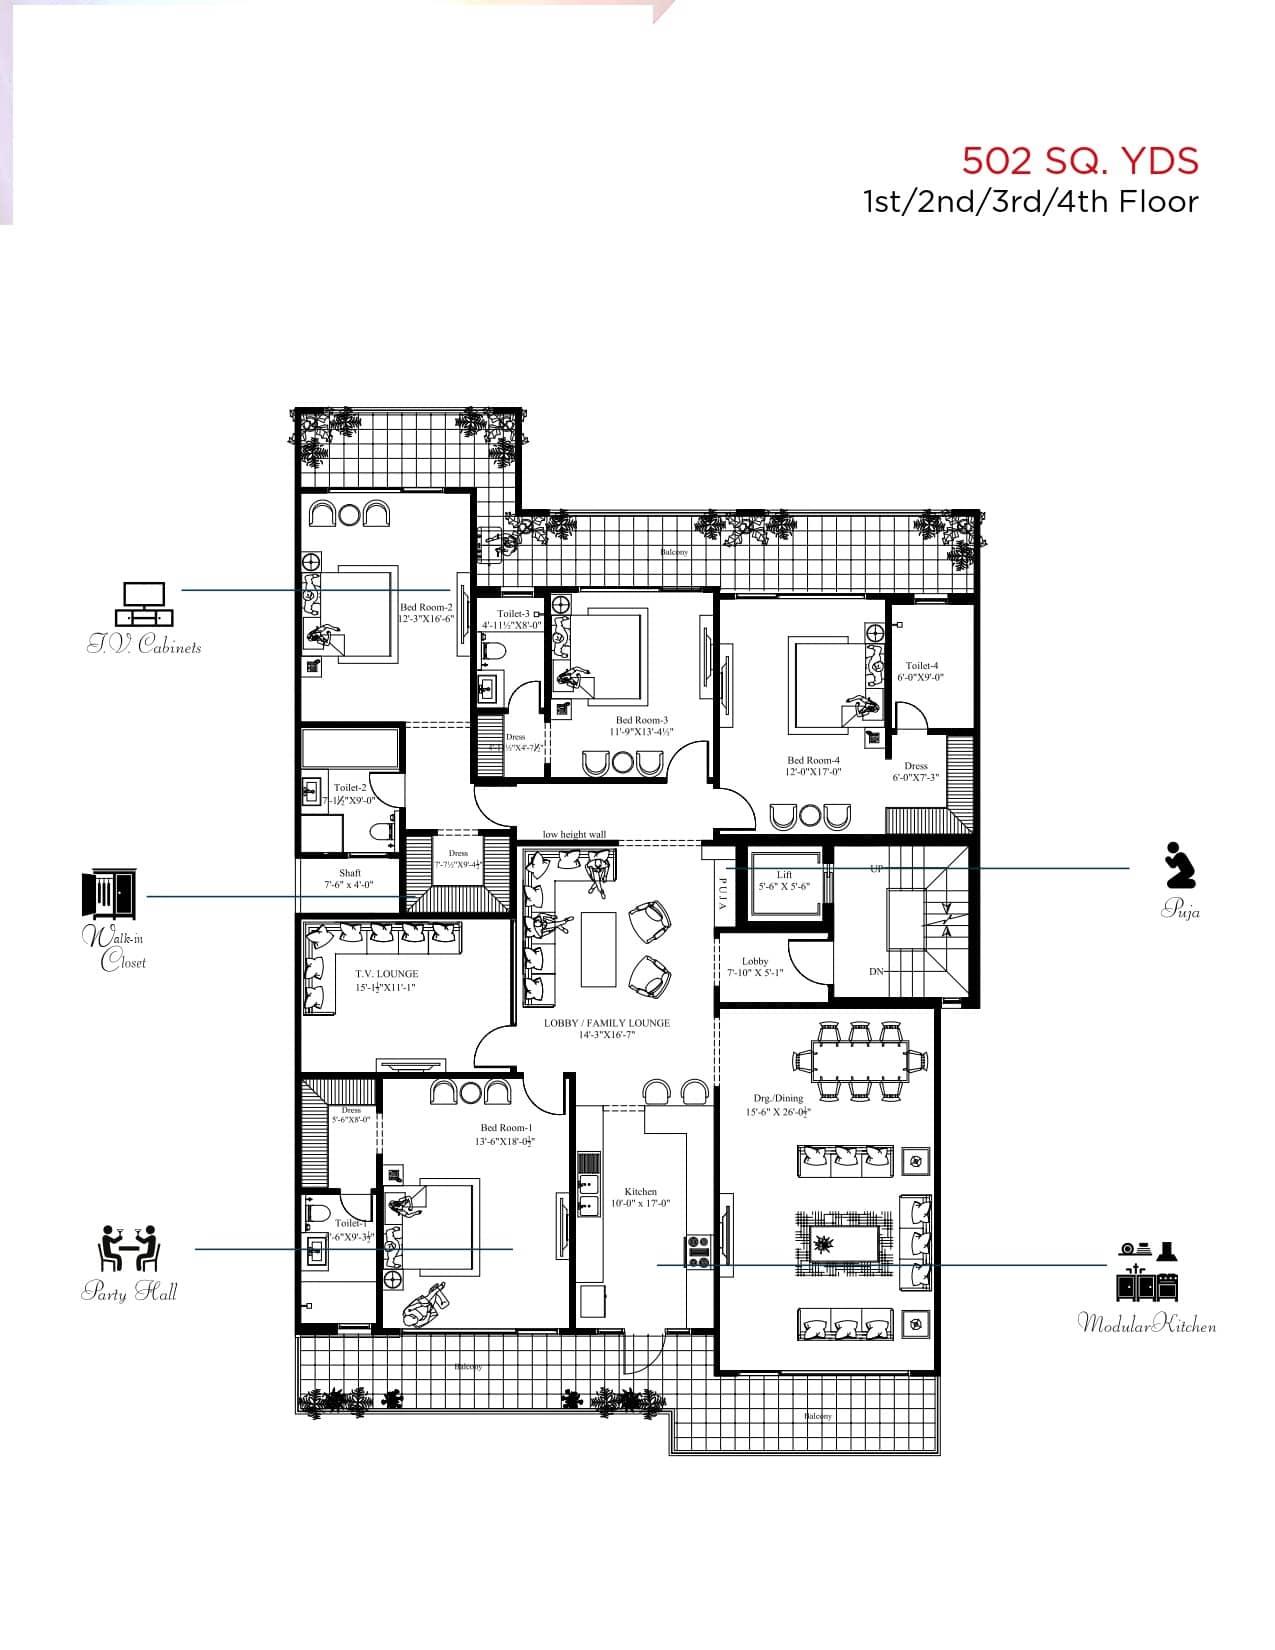 4 BHK Floor Plan + Servant Stilt